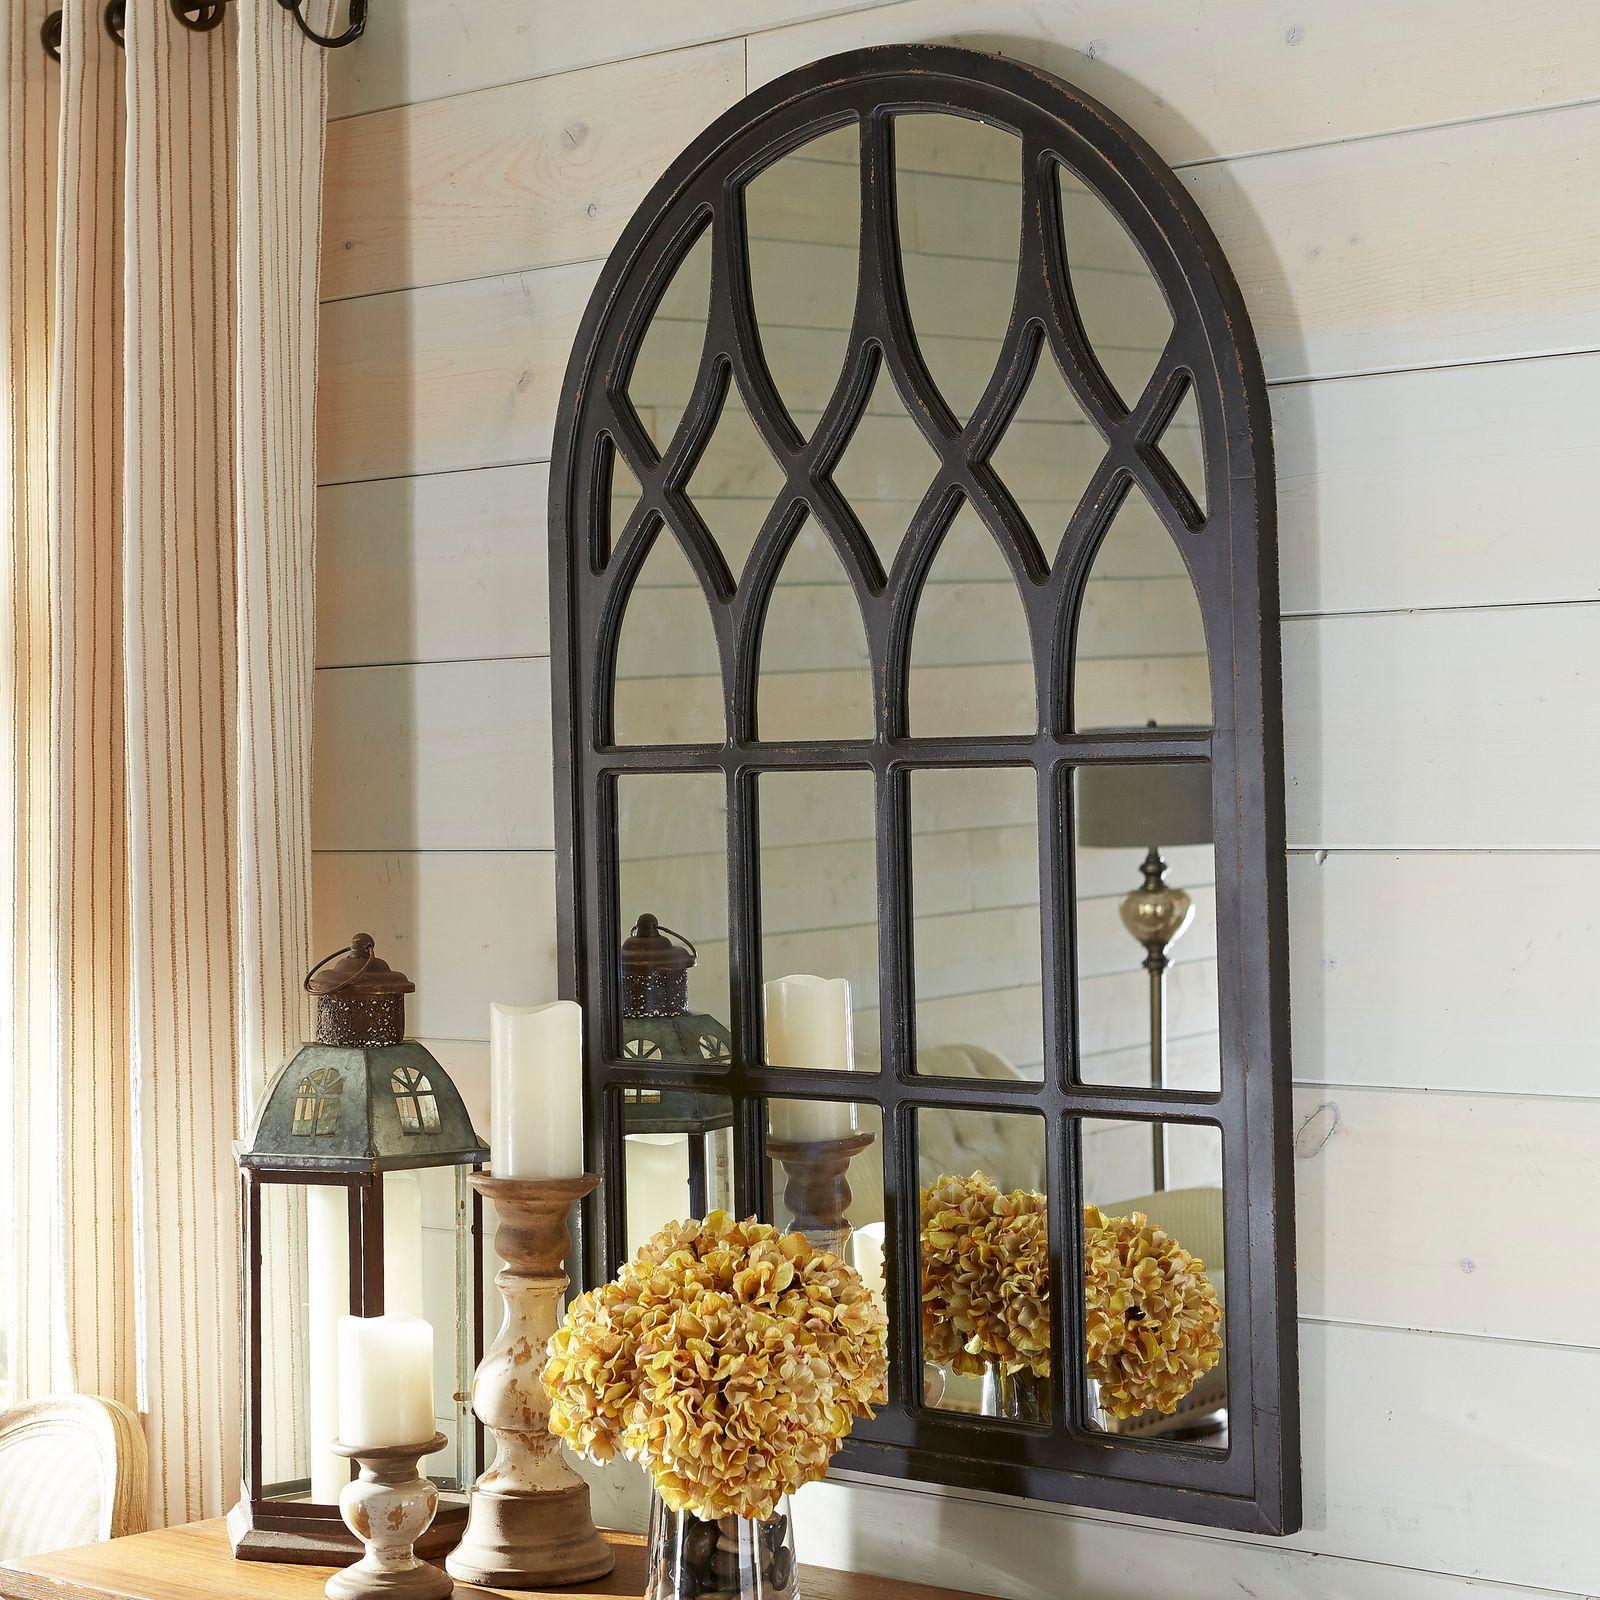 Window mirror decor  black washed window mirror  our modern farmhouse  pinterest